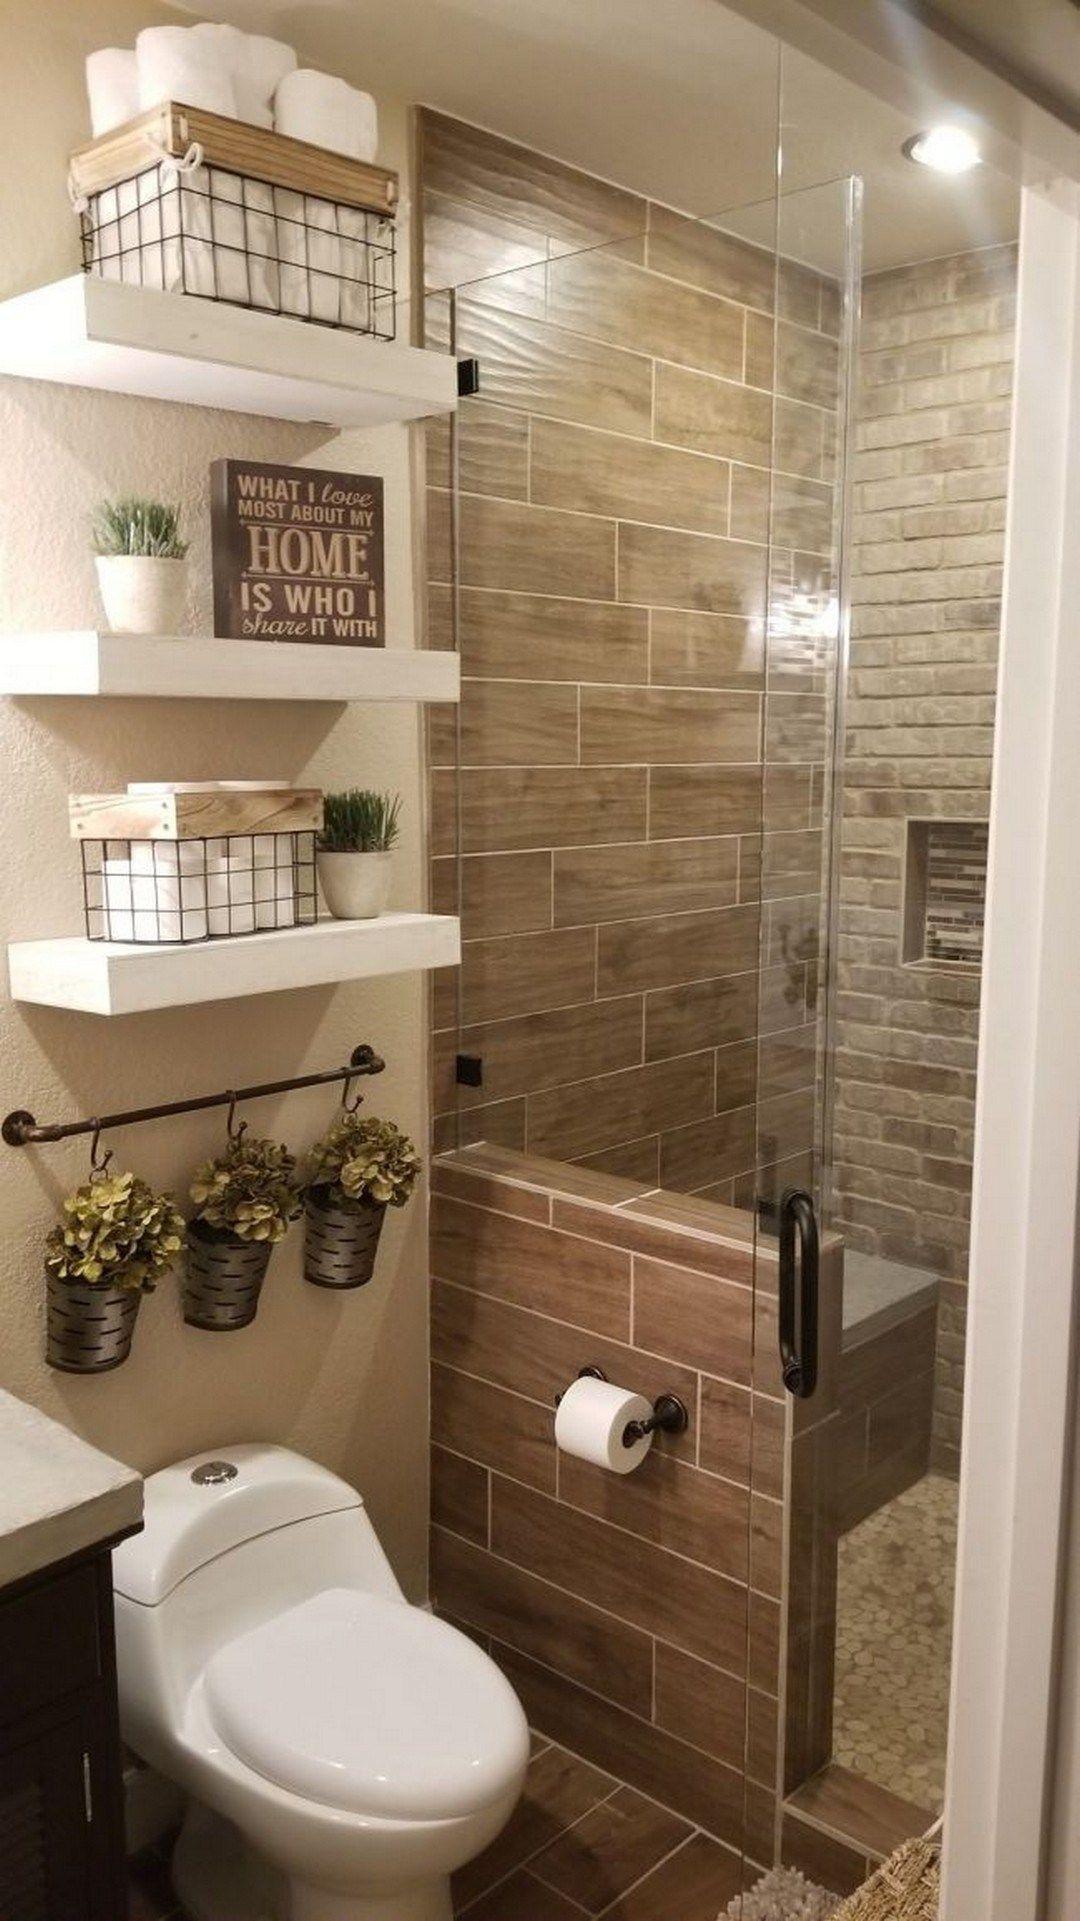 √ 3 Basement Bathroom Ideas with Best Scheme in 3 - Harp Times